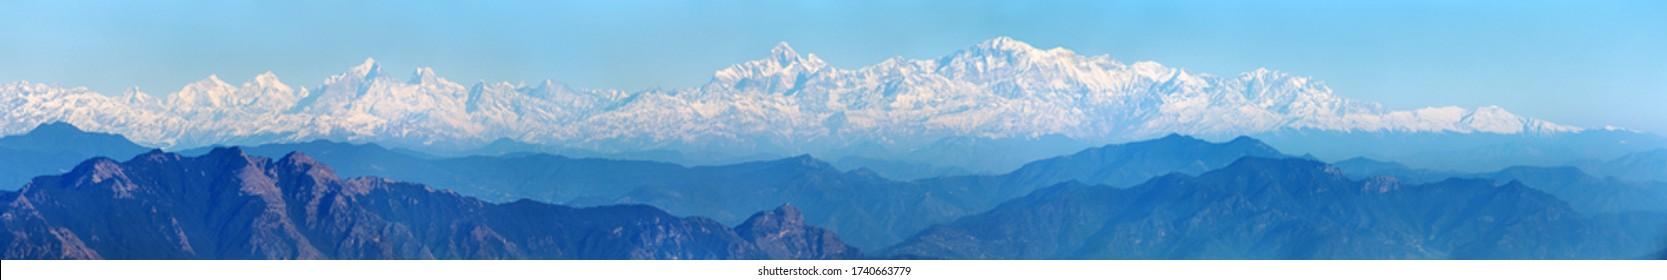 Himalaya, panoramic view of Indian Himalayas, great Himalayan range, Uttarakhand India, view from Mussoorie road, mount Nanda Devi